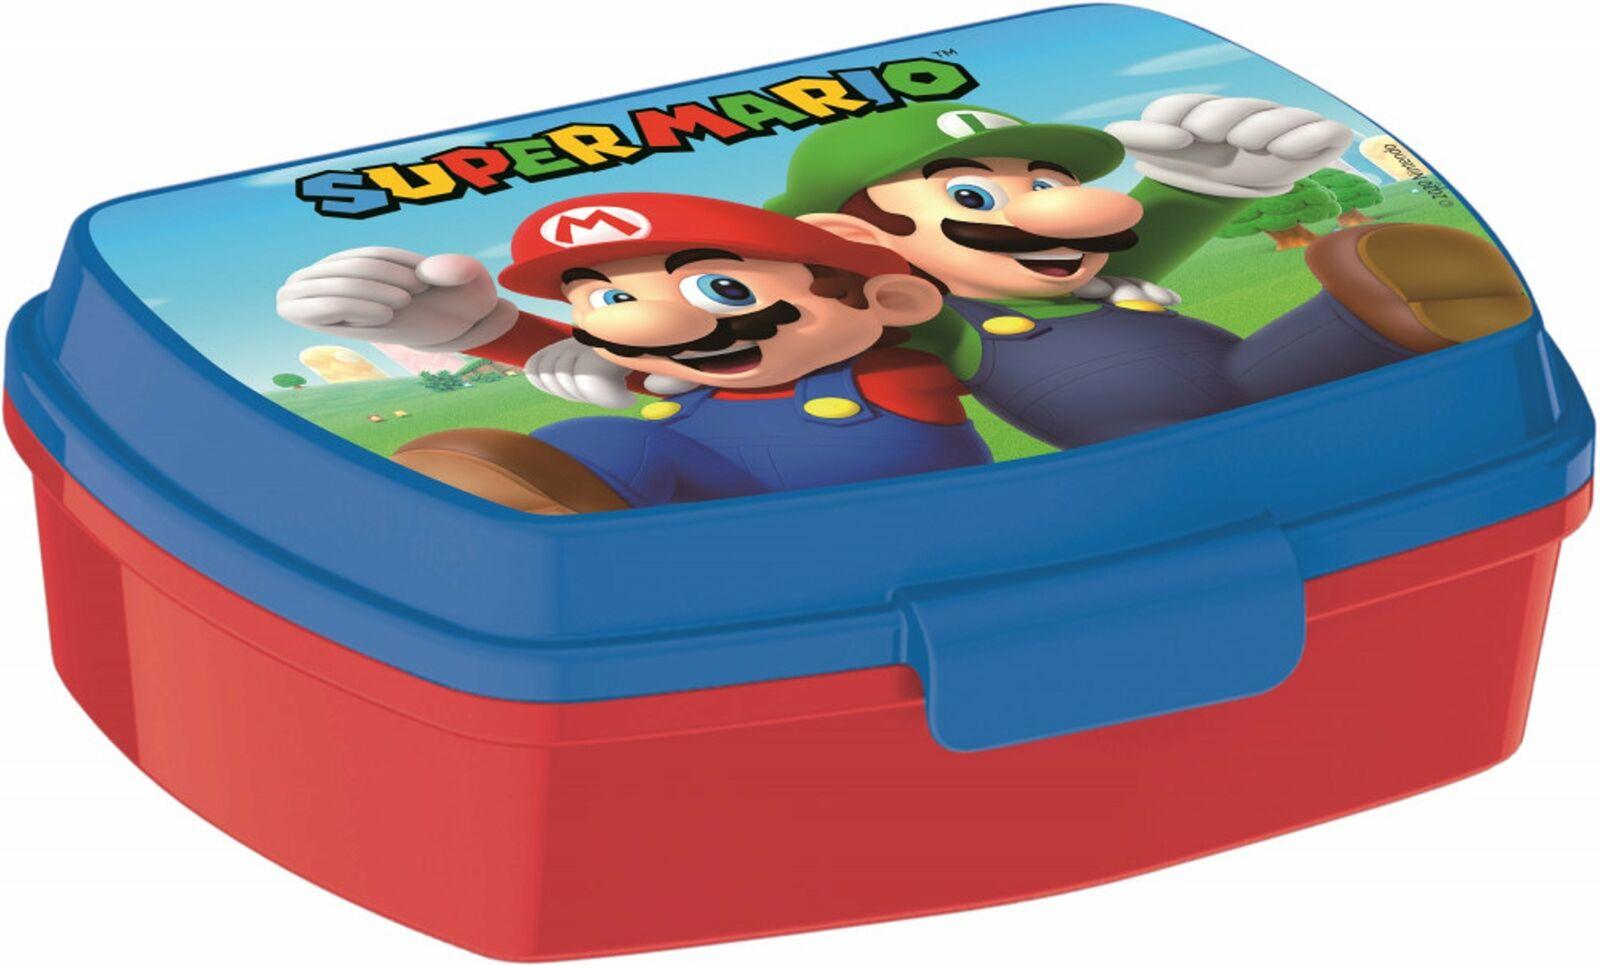 Super Mario Kinder Brotdose Lunchbox Sandwichbox rot-blau